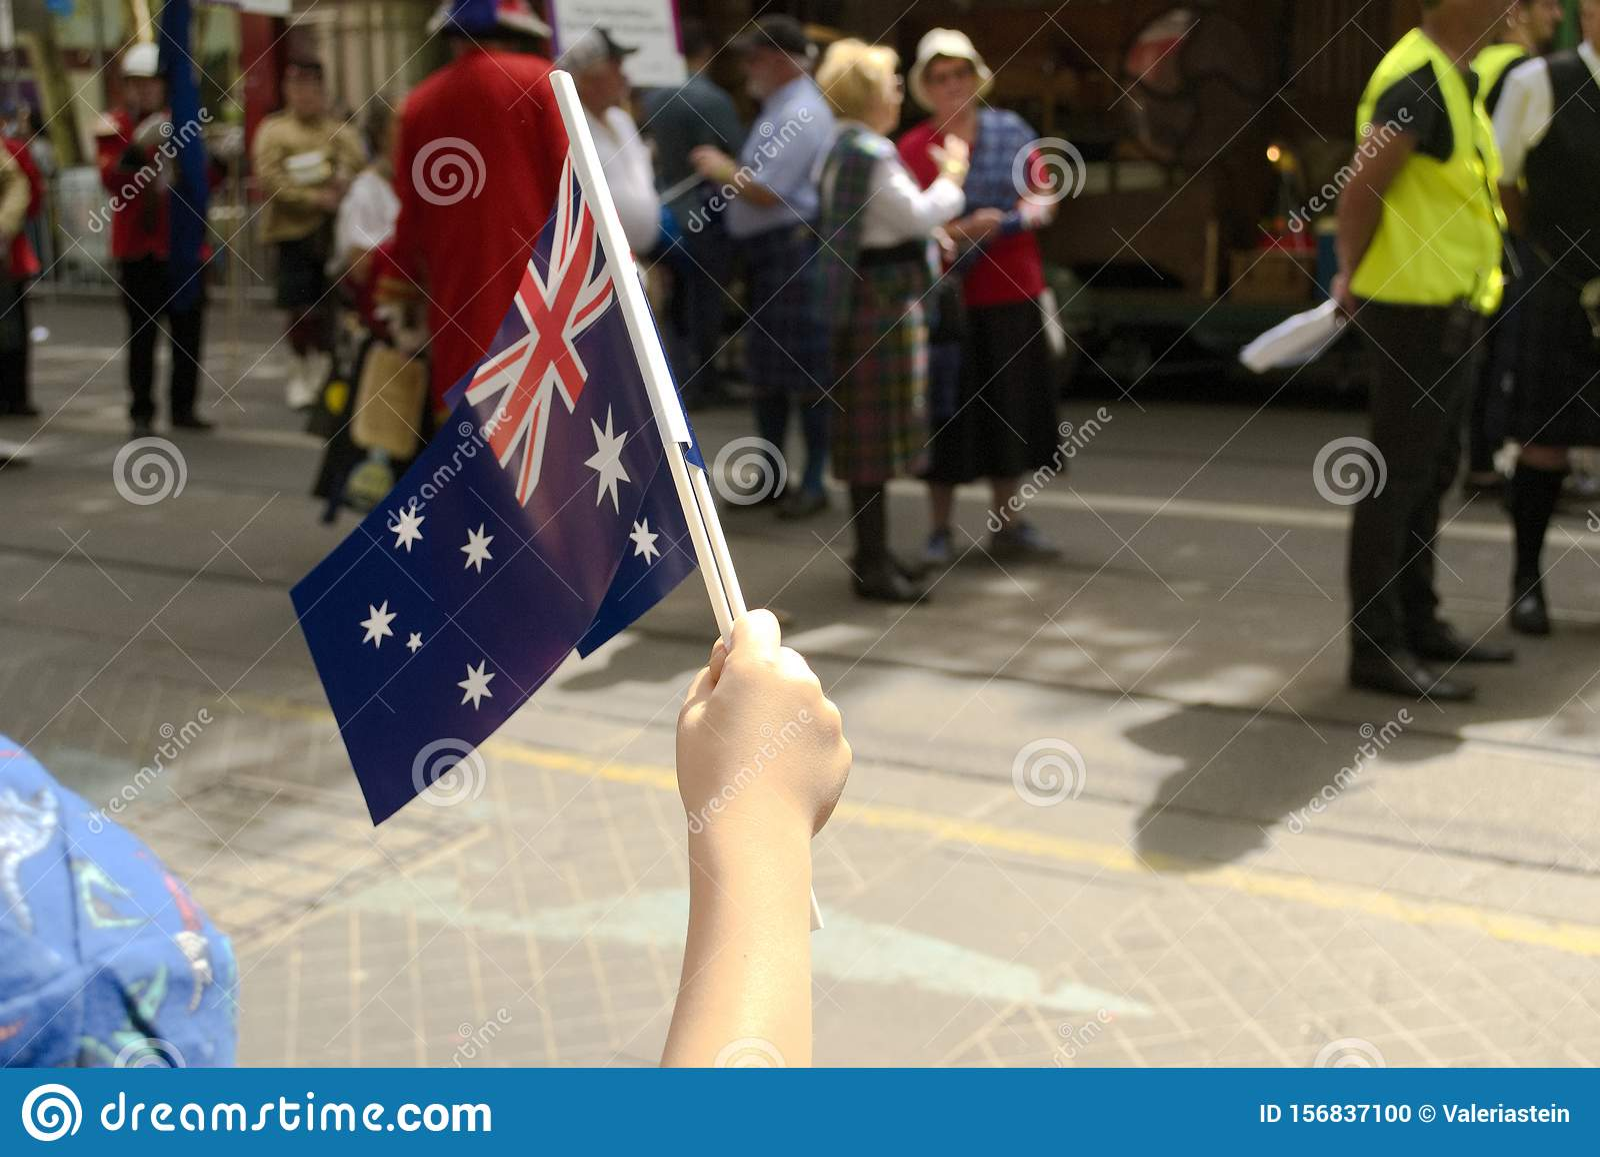 Australia Day in Melbourne - January 26, 2019. Child waving Australian Flag